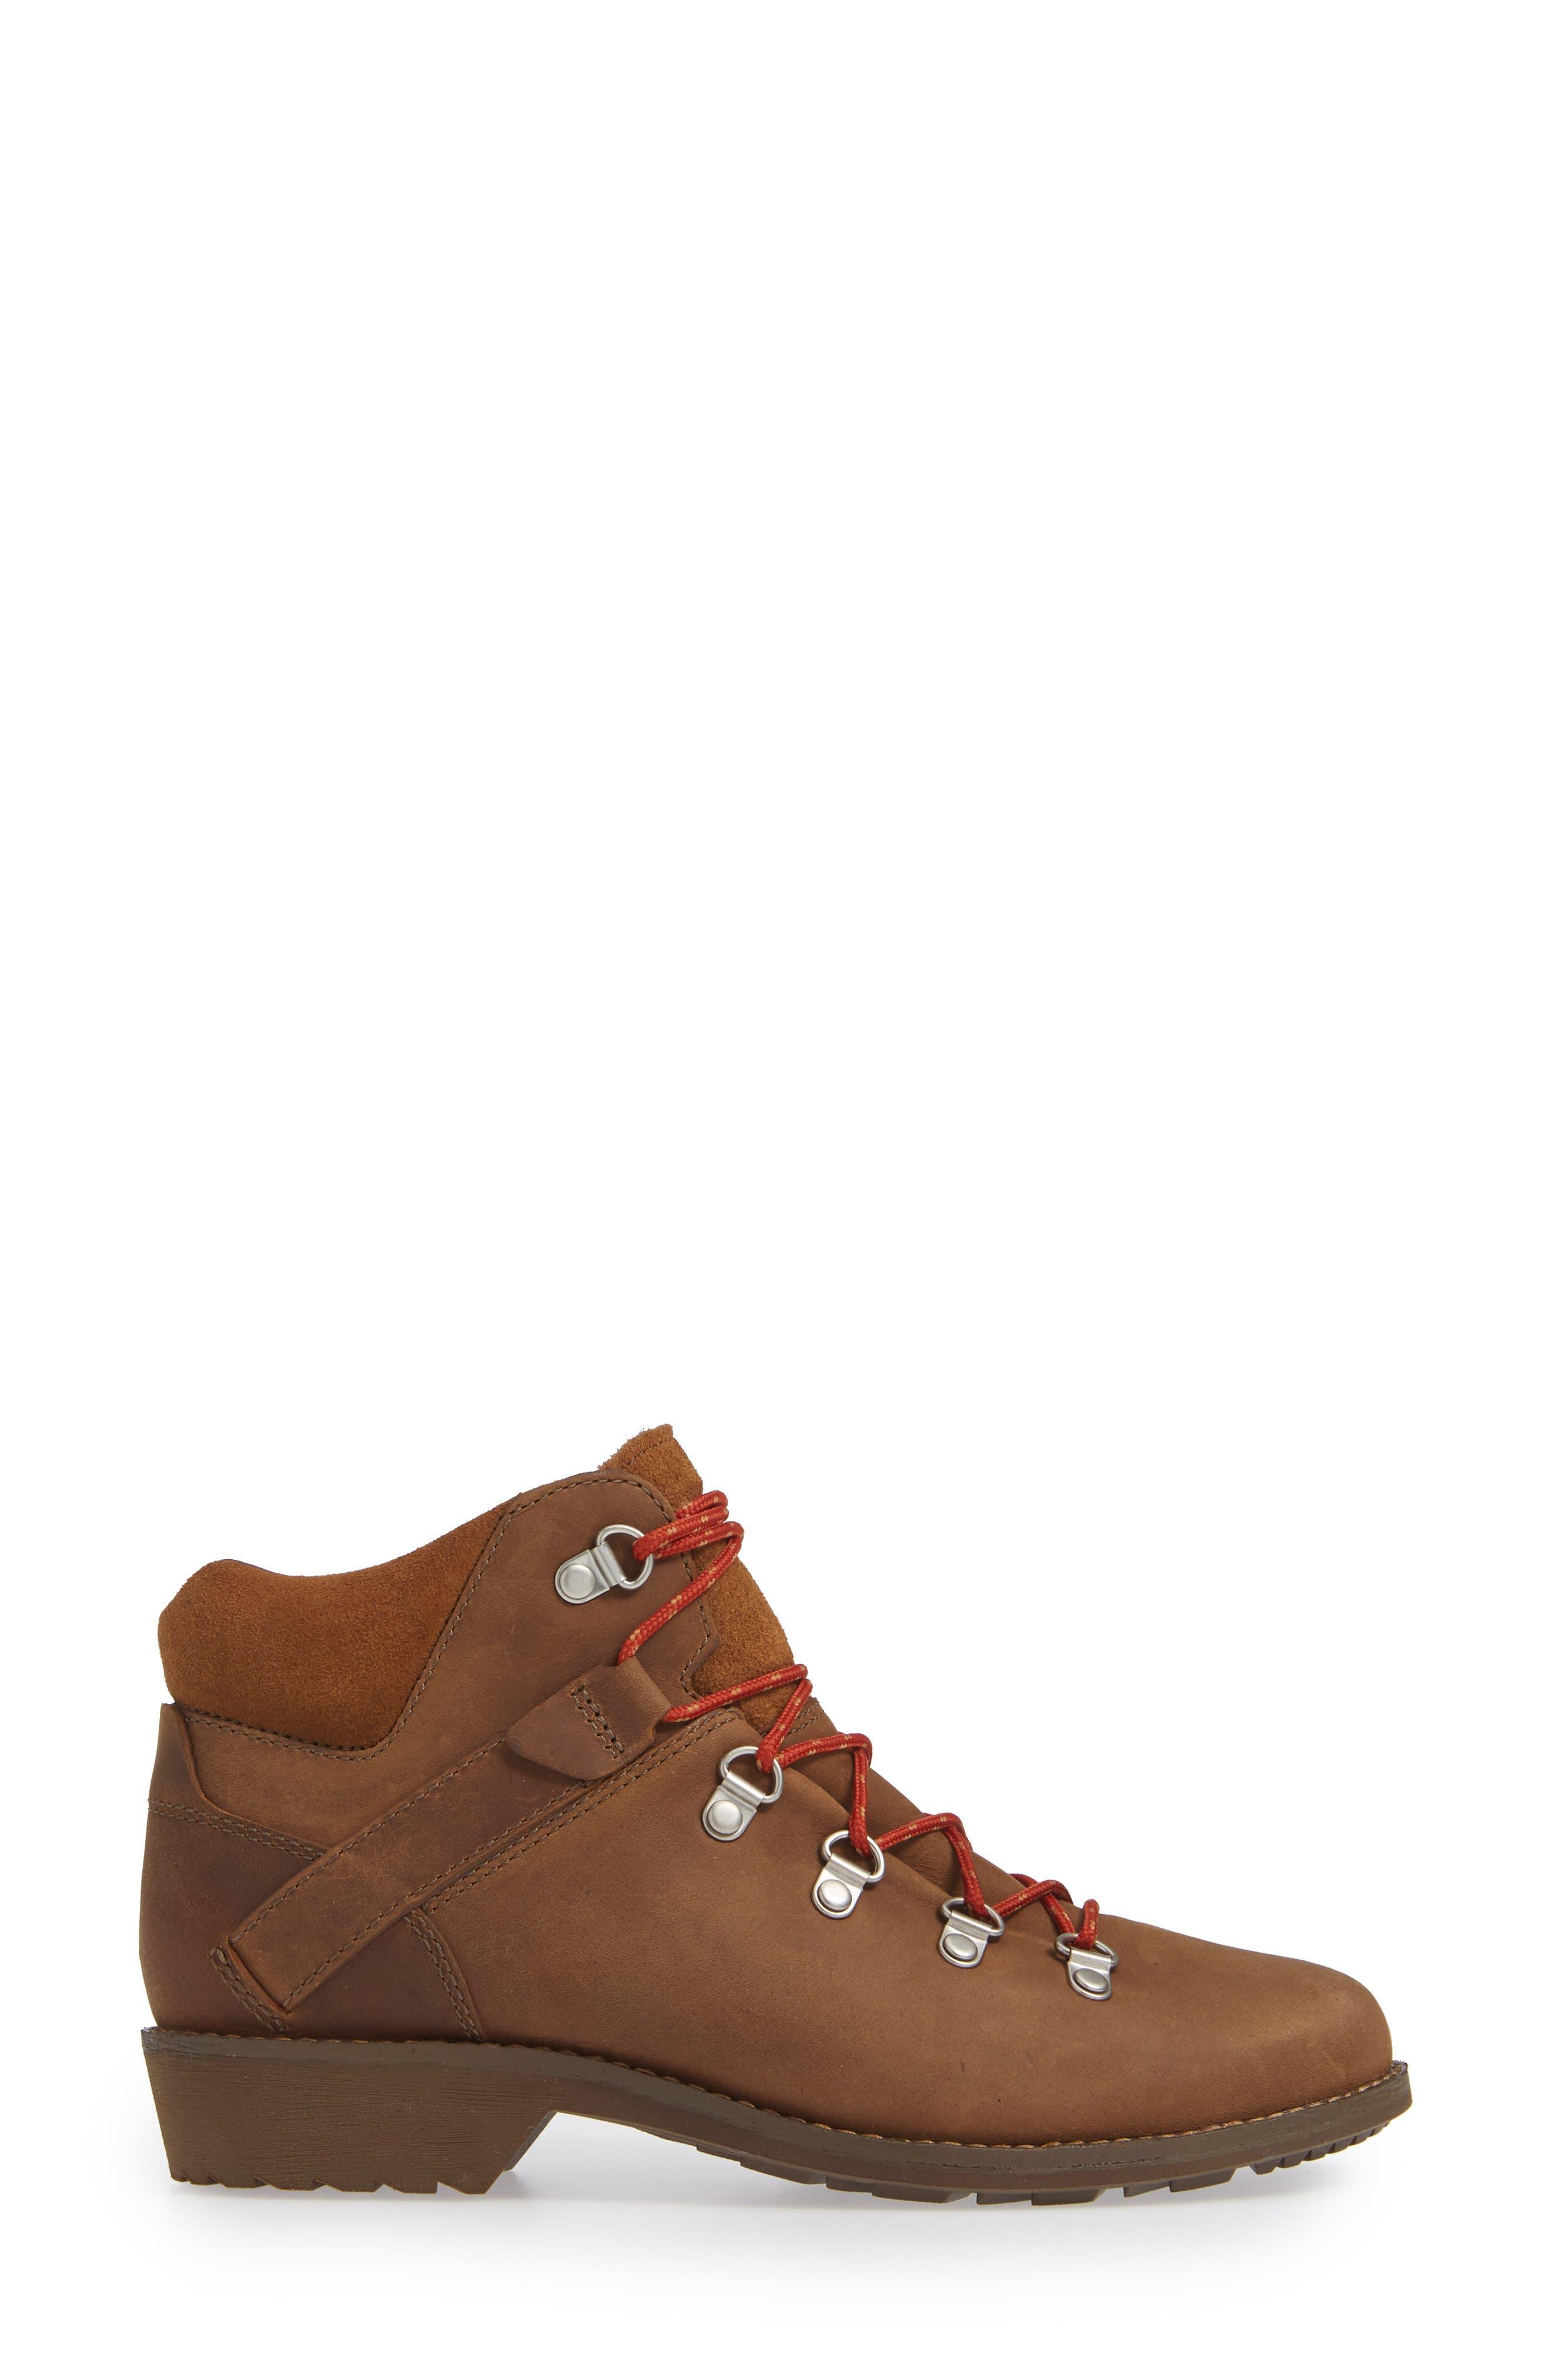 De La Vina Dos Alpine Waterproof Low Boot,                             Alternate thumbnail 3, color,                             PECAN LEATHER